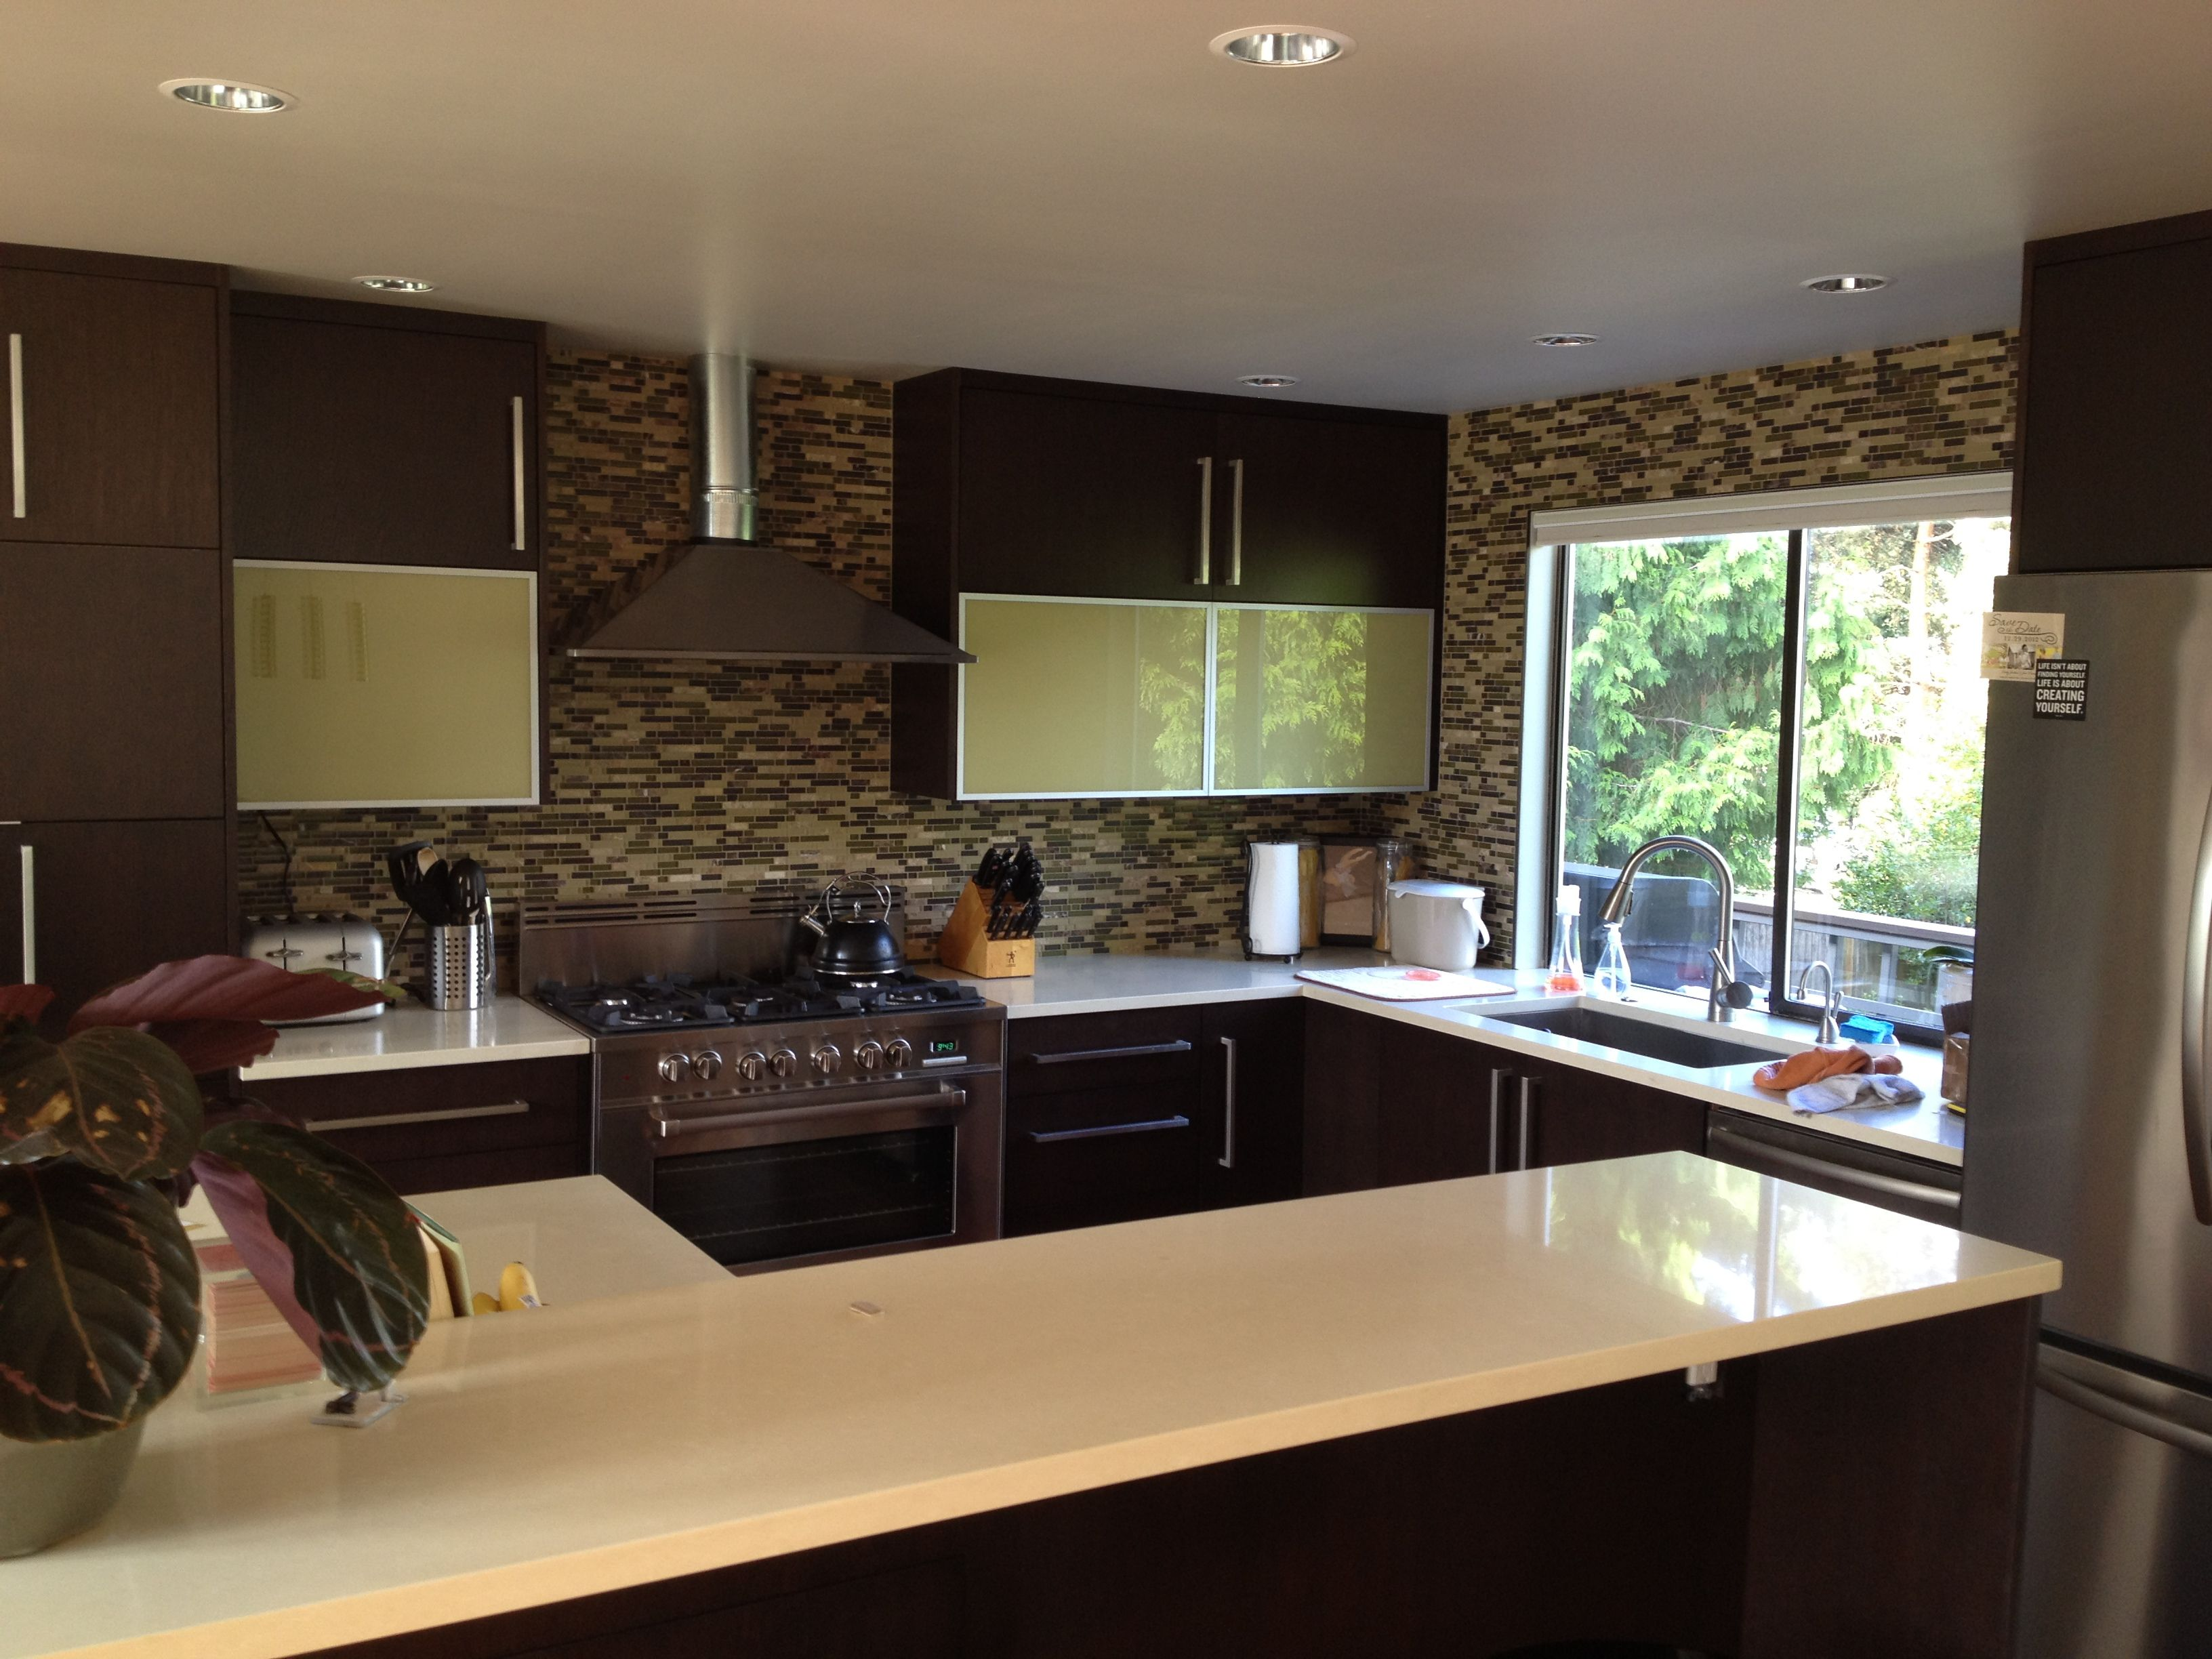 endearing split level home renovations before and after. Split Entry Remodel Before And After  in modernizing and remodeling our split